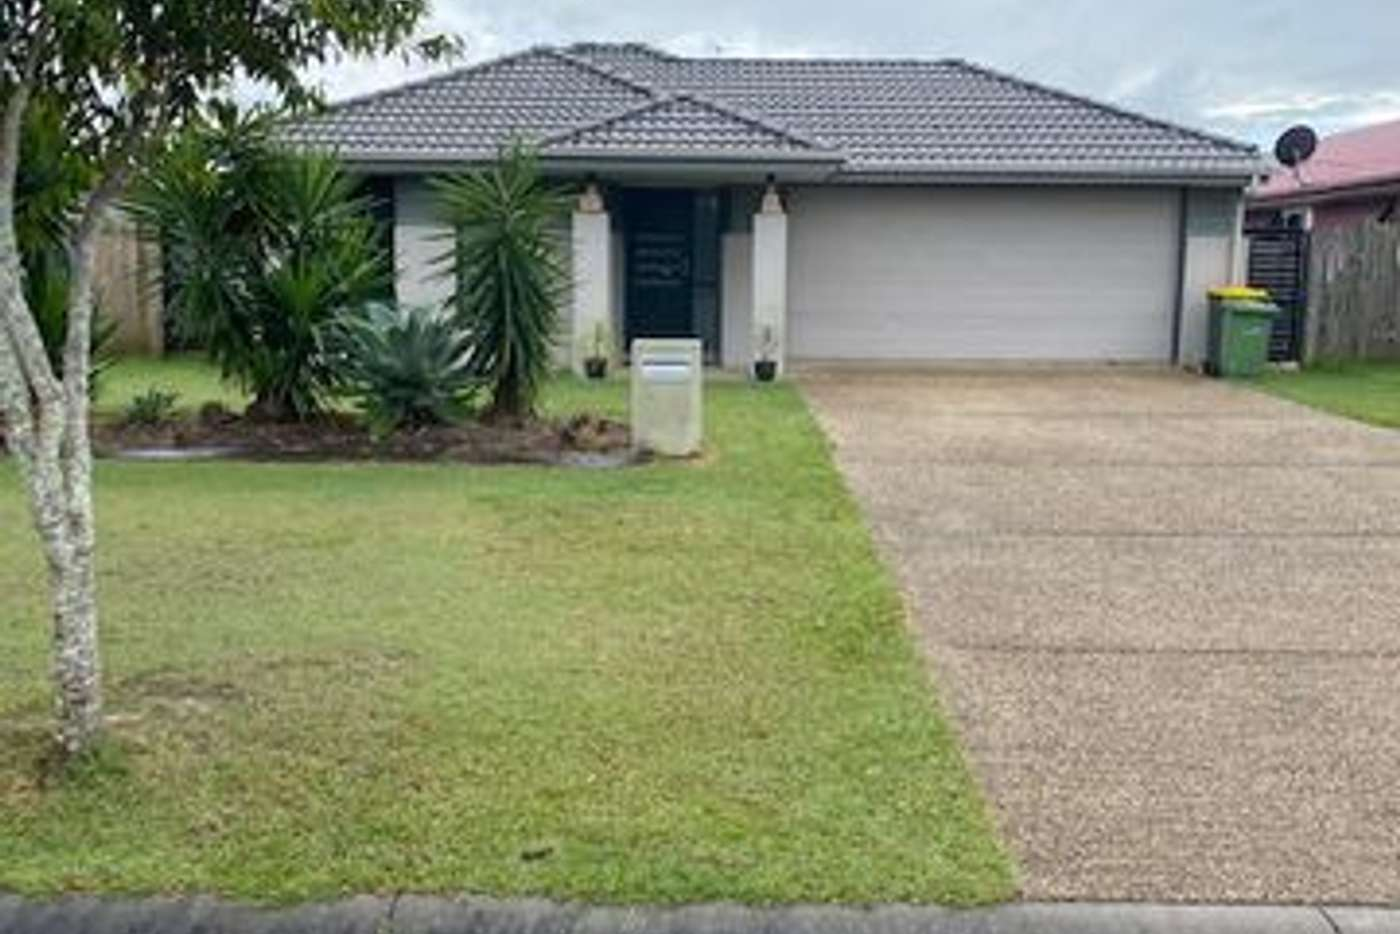 Main view of Homely house listing, 26 Broadleaf Place, Ningi QLD 4511